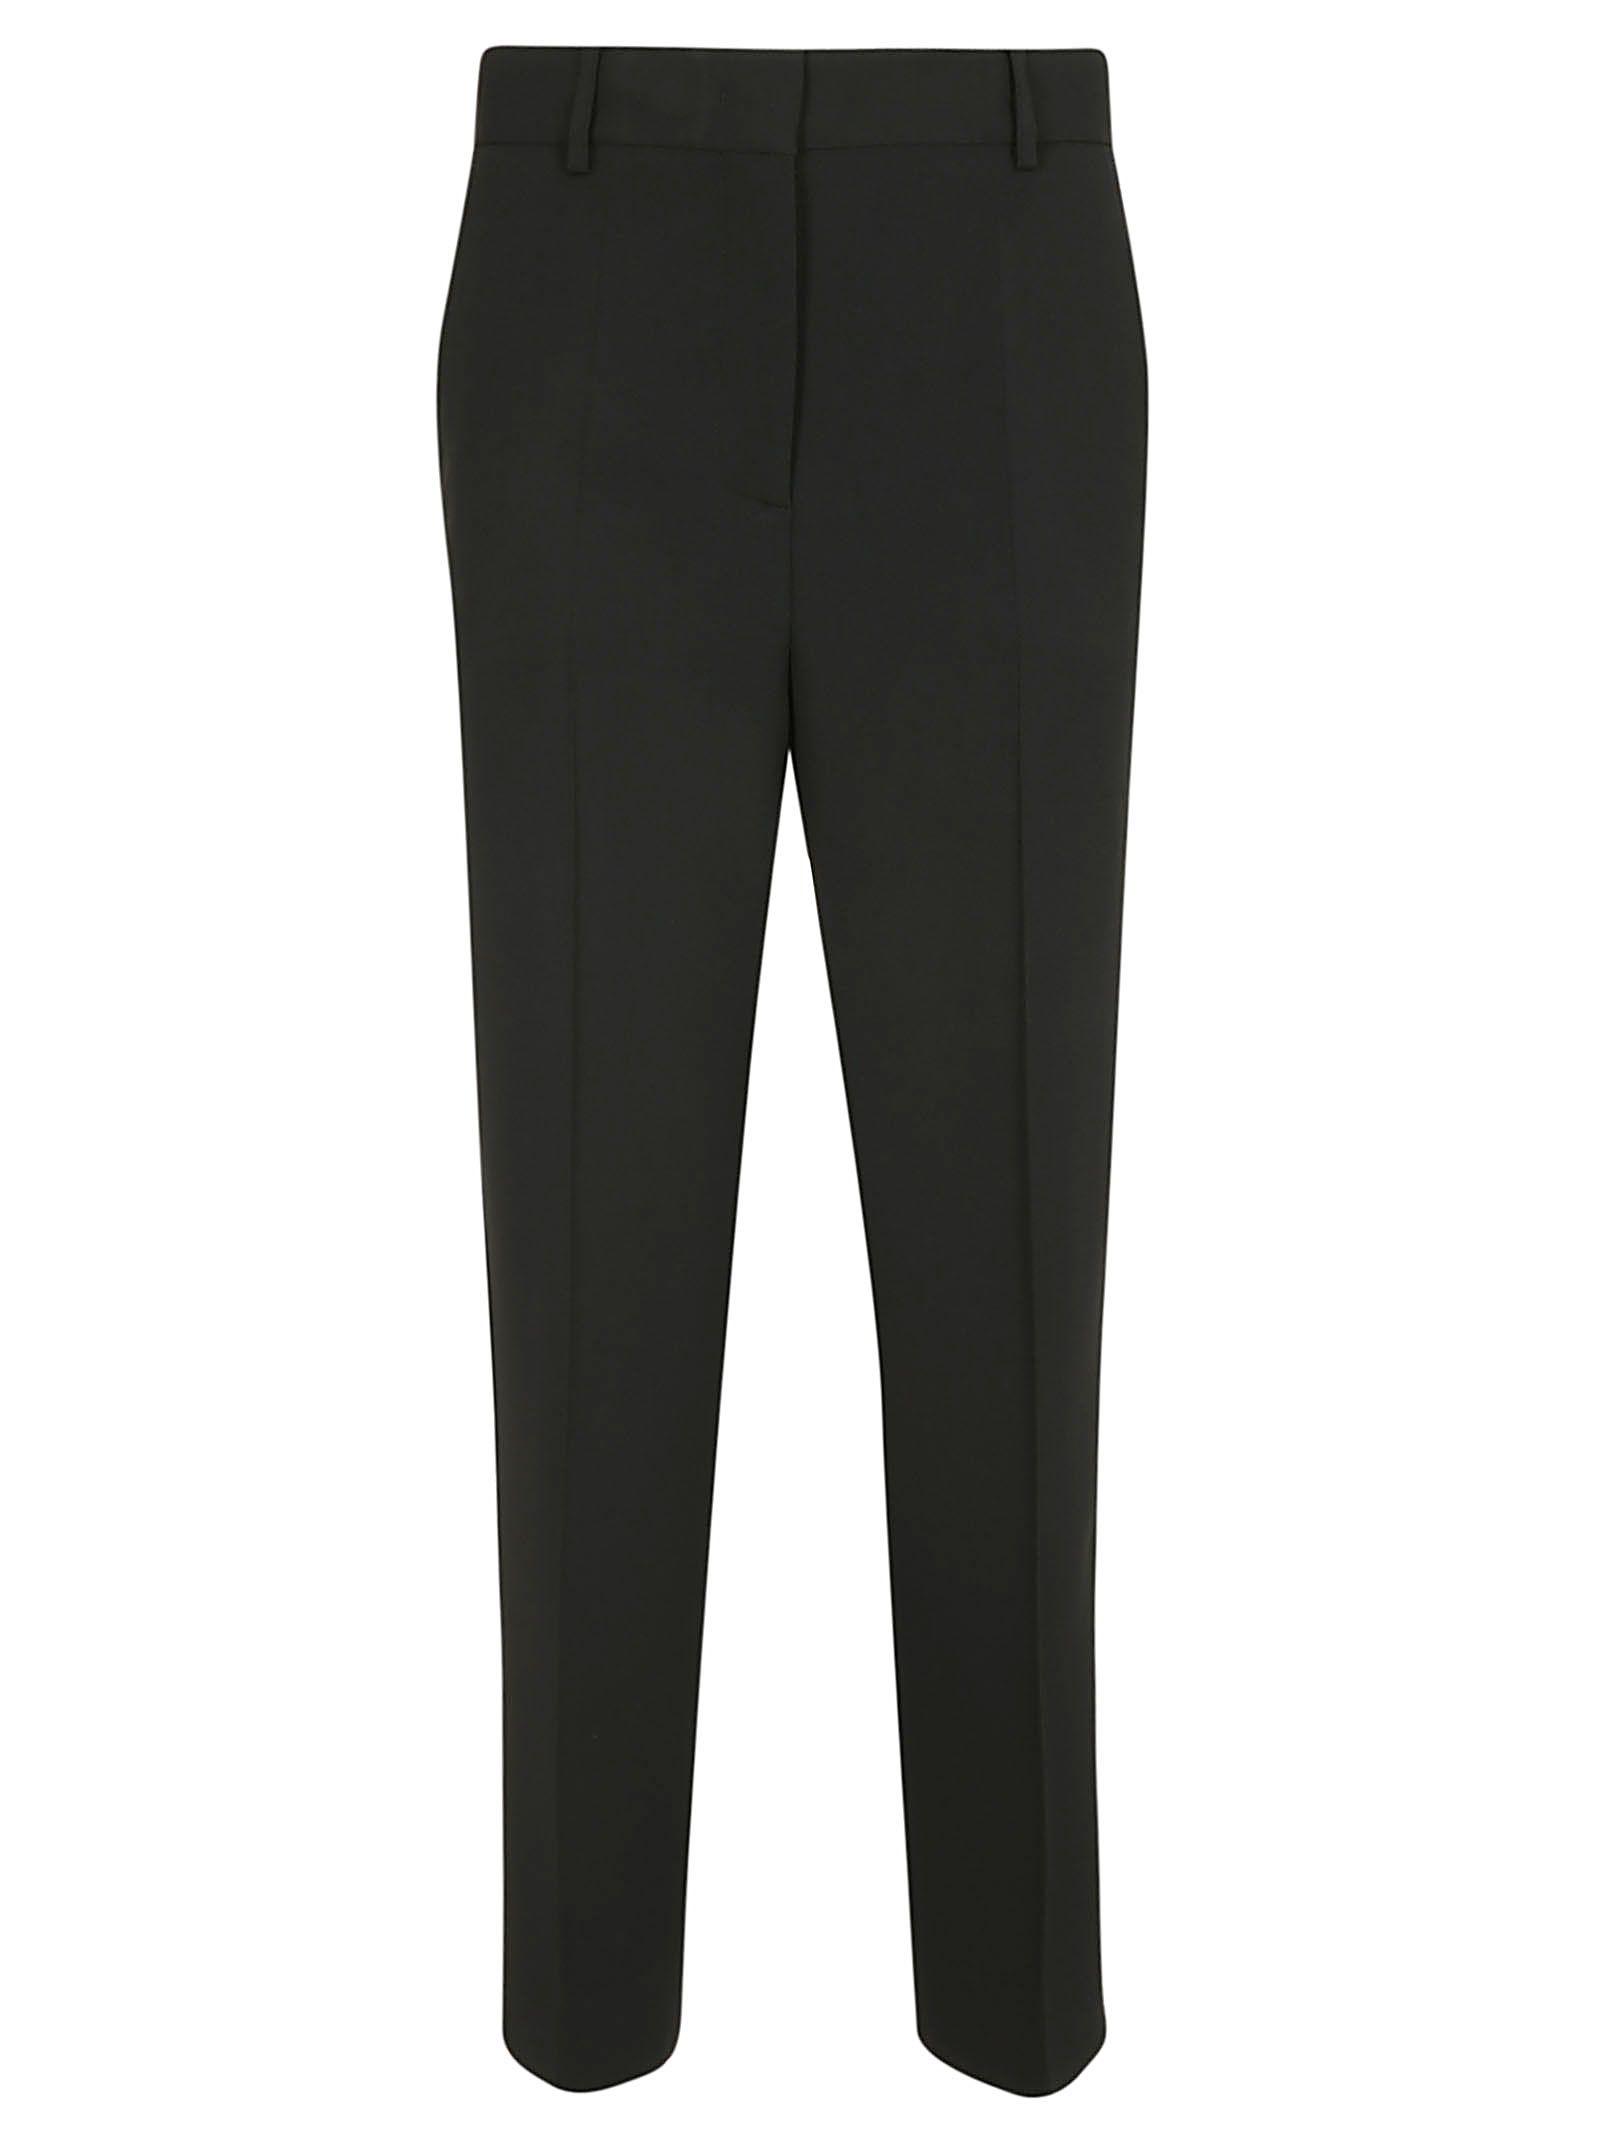 NEWYORKINDUSTRIE New York Industrie Classic Trousers in Black